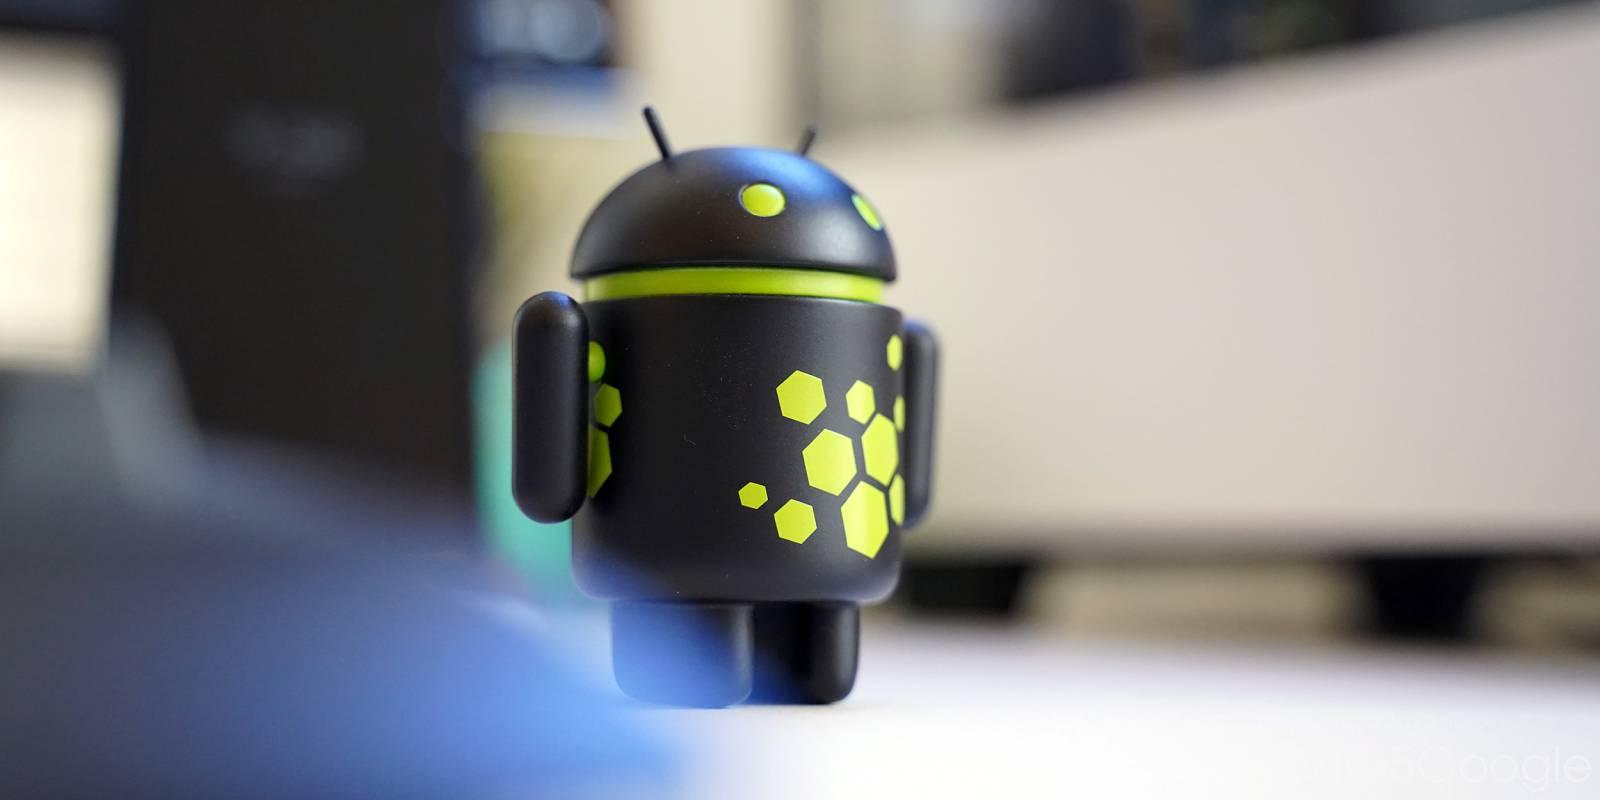 Android google malware triada